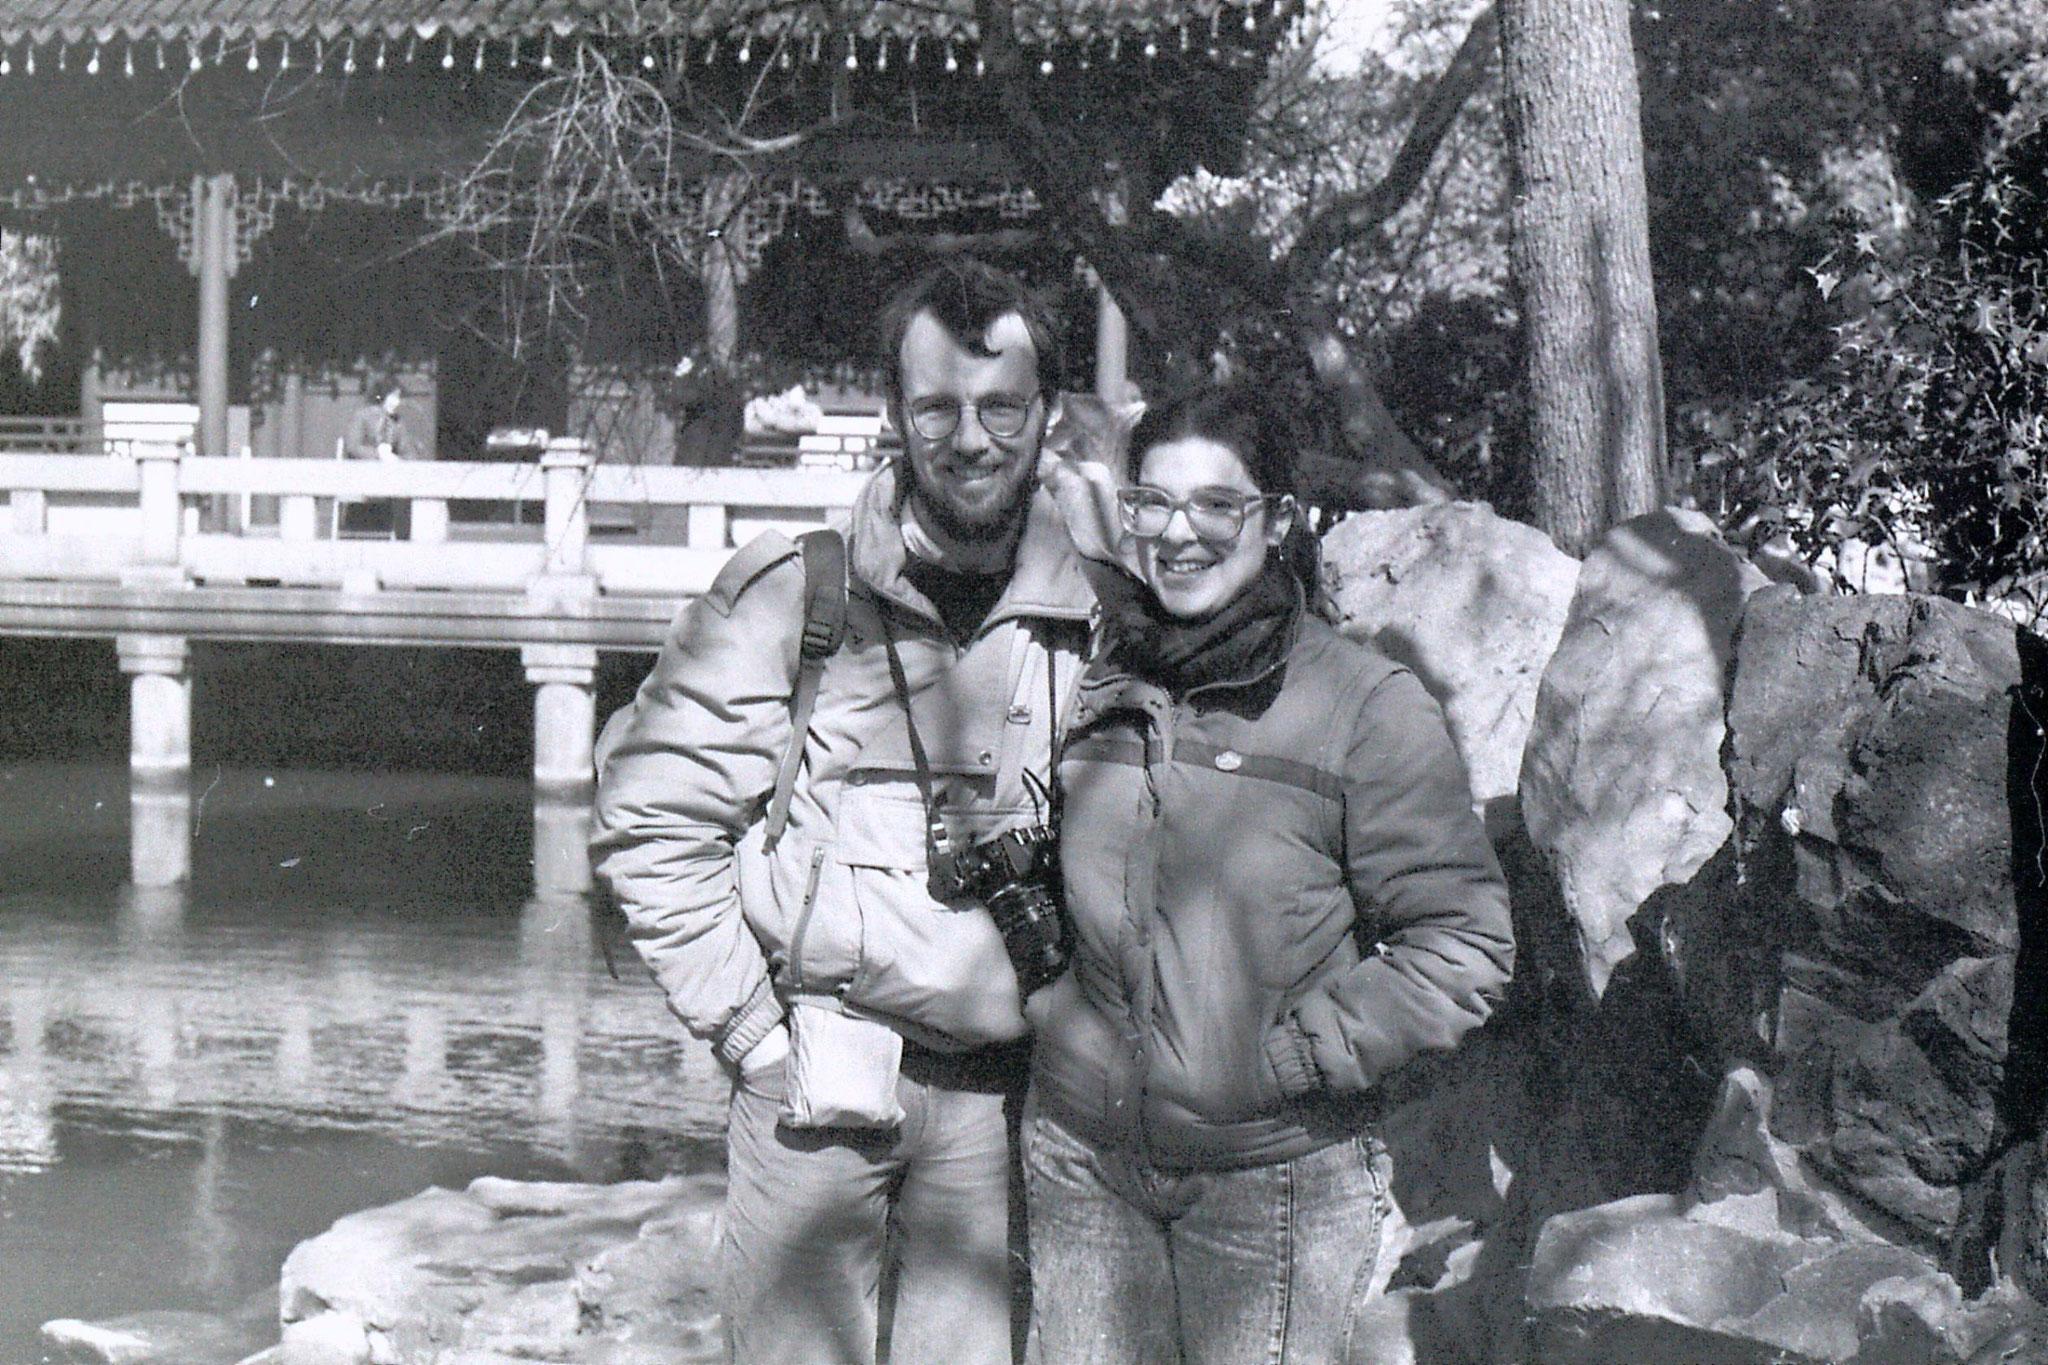 10/2/1989: 4: Shanghai Yuyuan Gardens